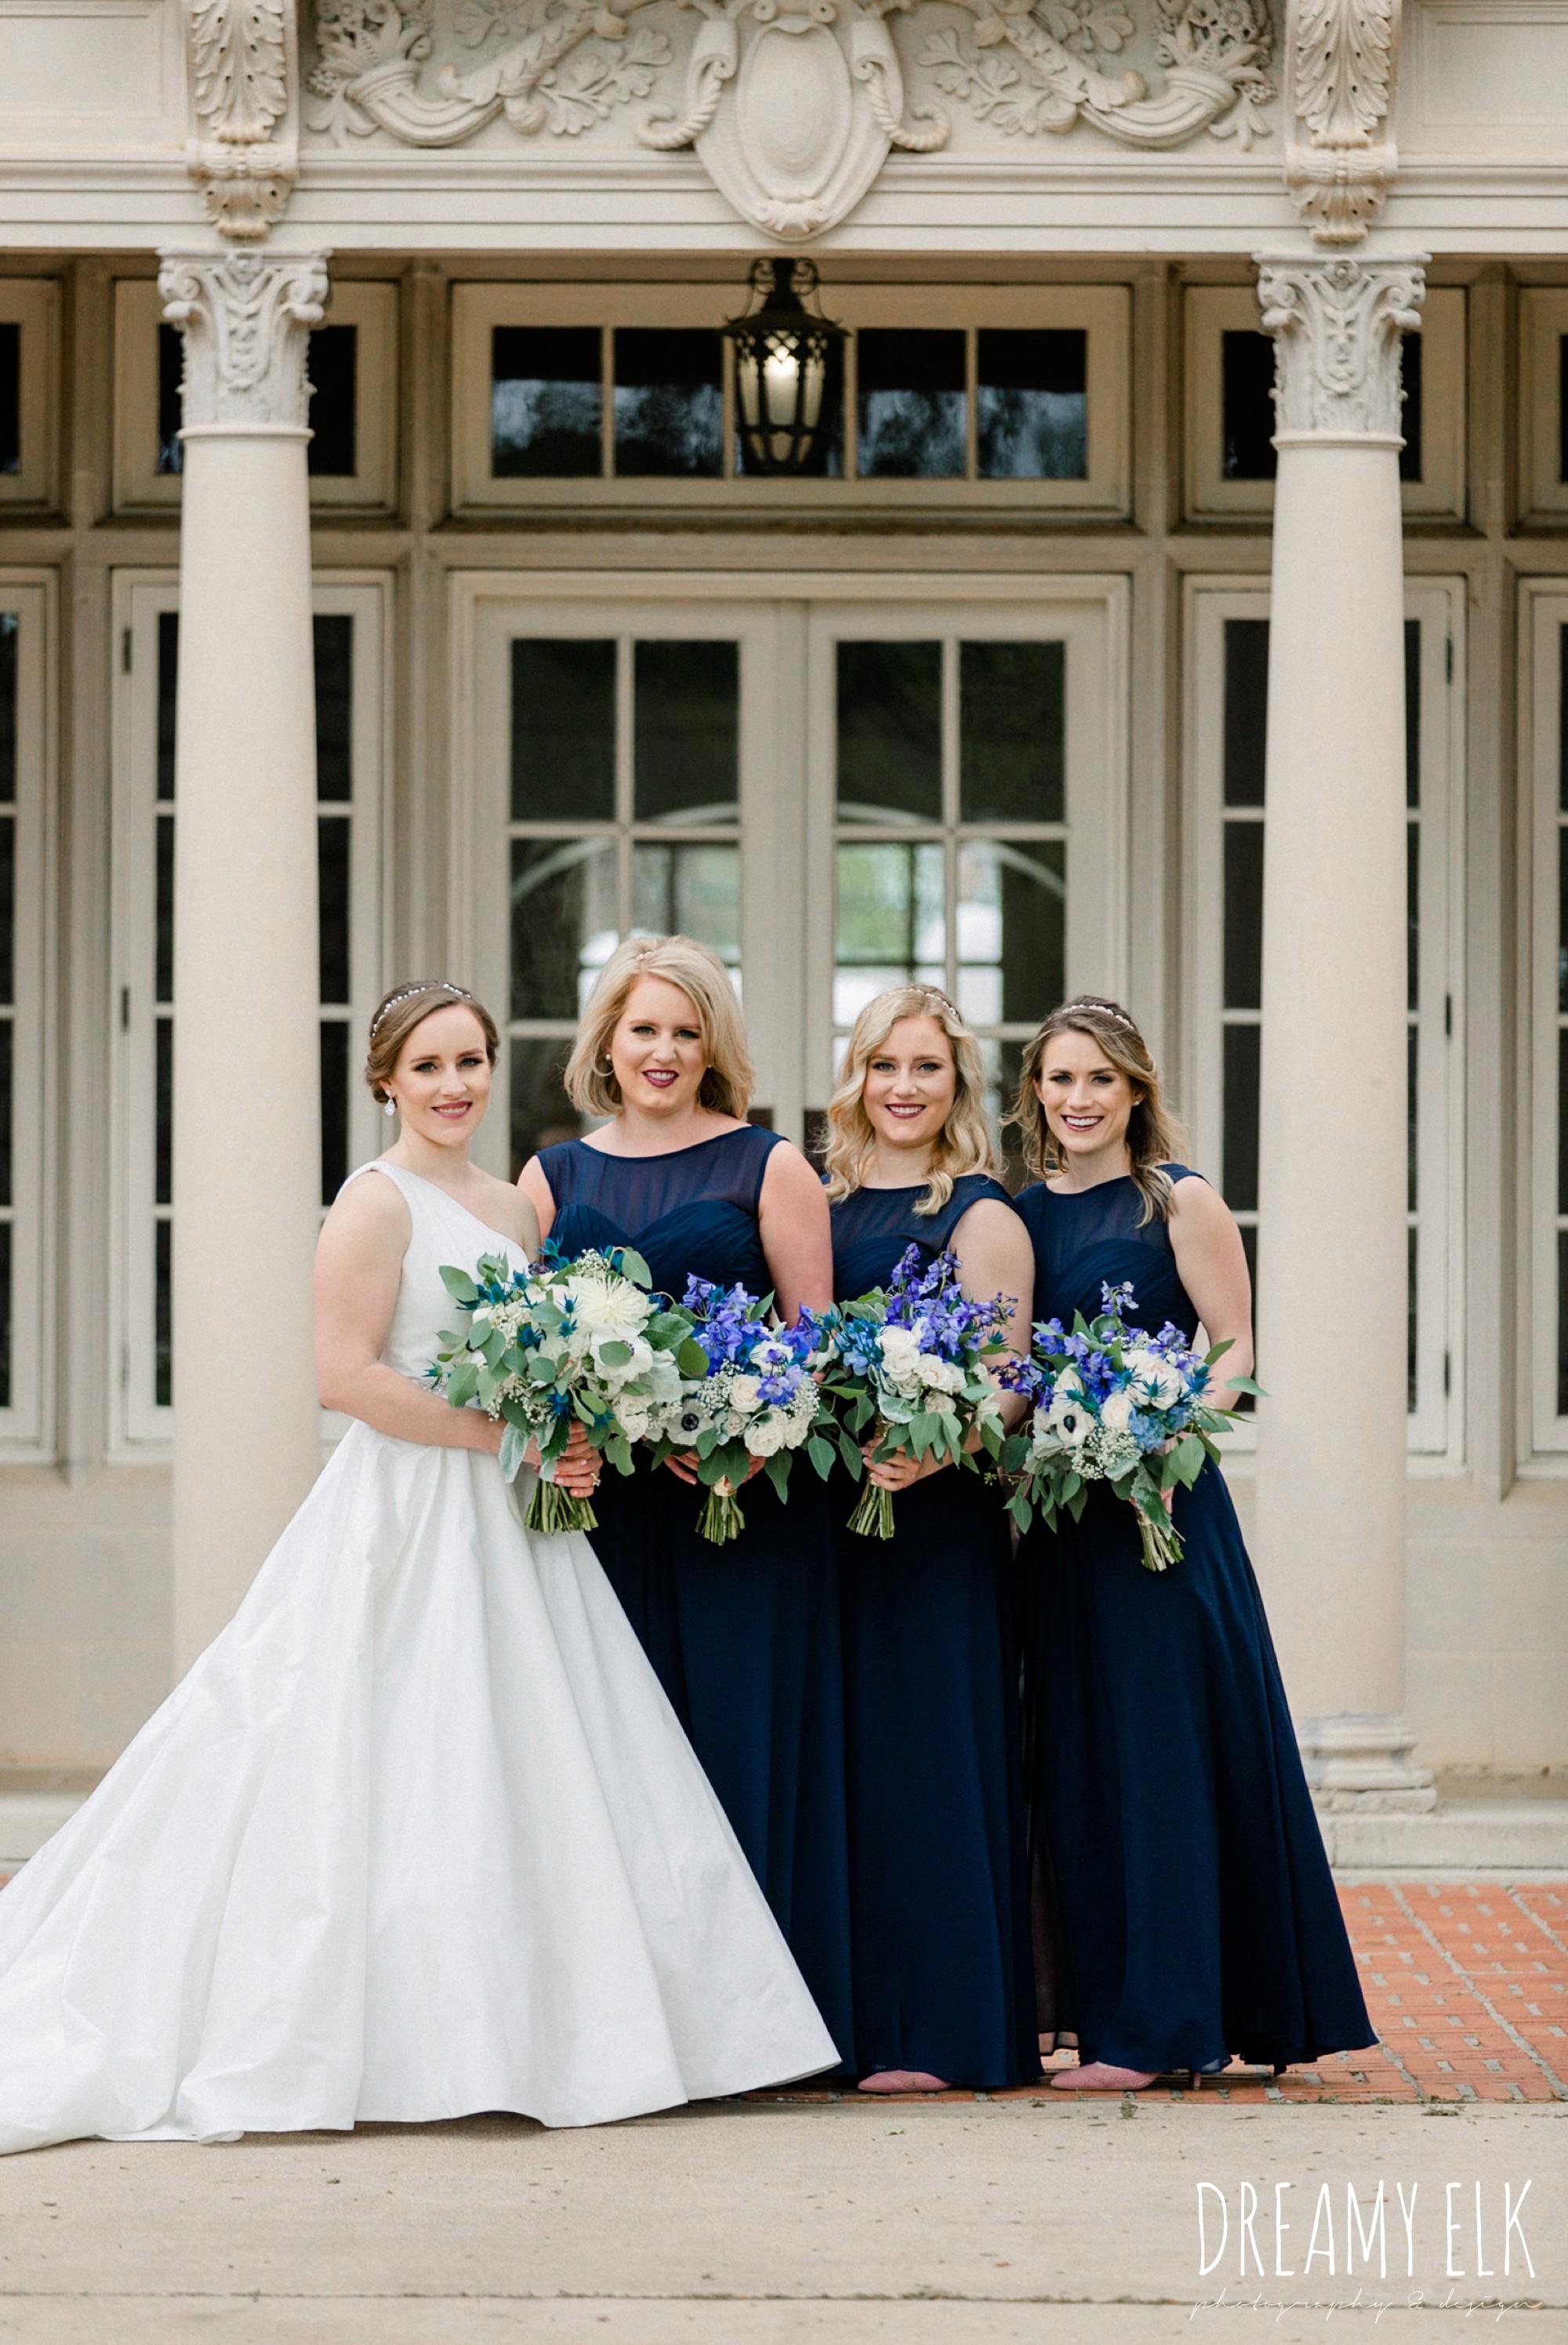 blue wedding bouquet, long navy bridesmaid dress, modern wedding dress ballgown, spring wedding, the astin mansion, bryan, texas, spring wedding, dreamy elk photography and design